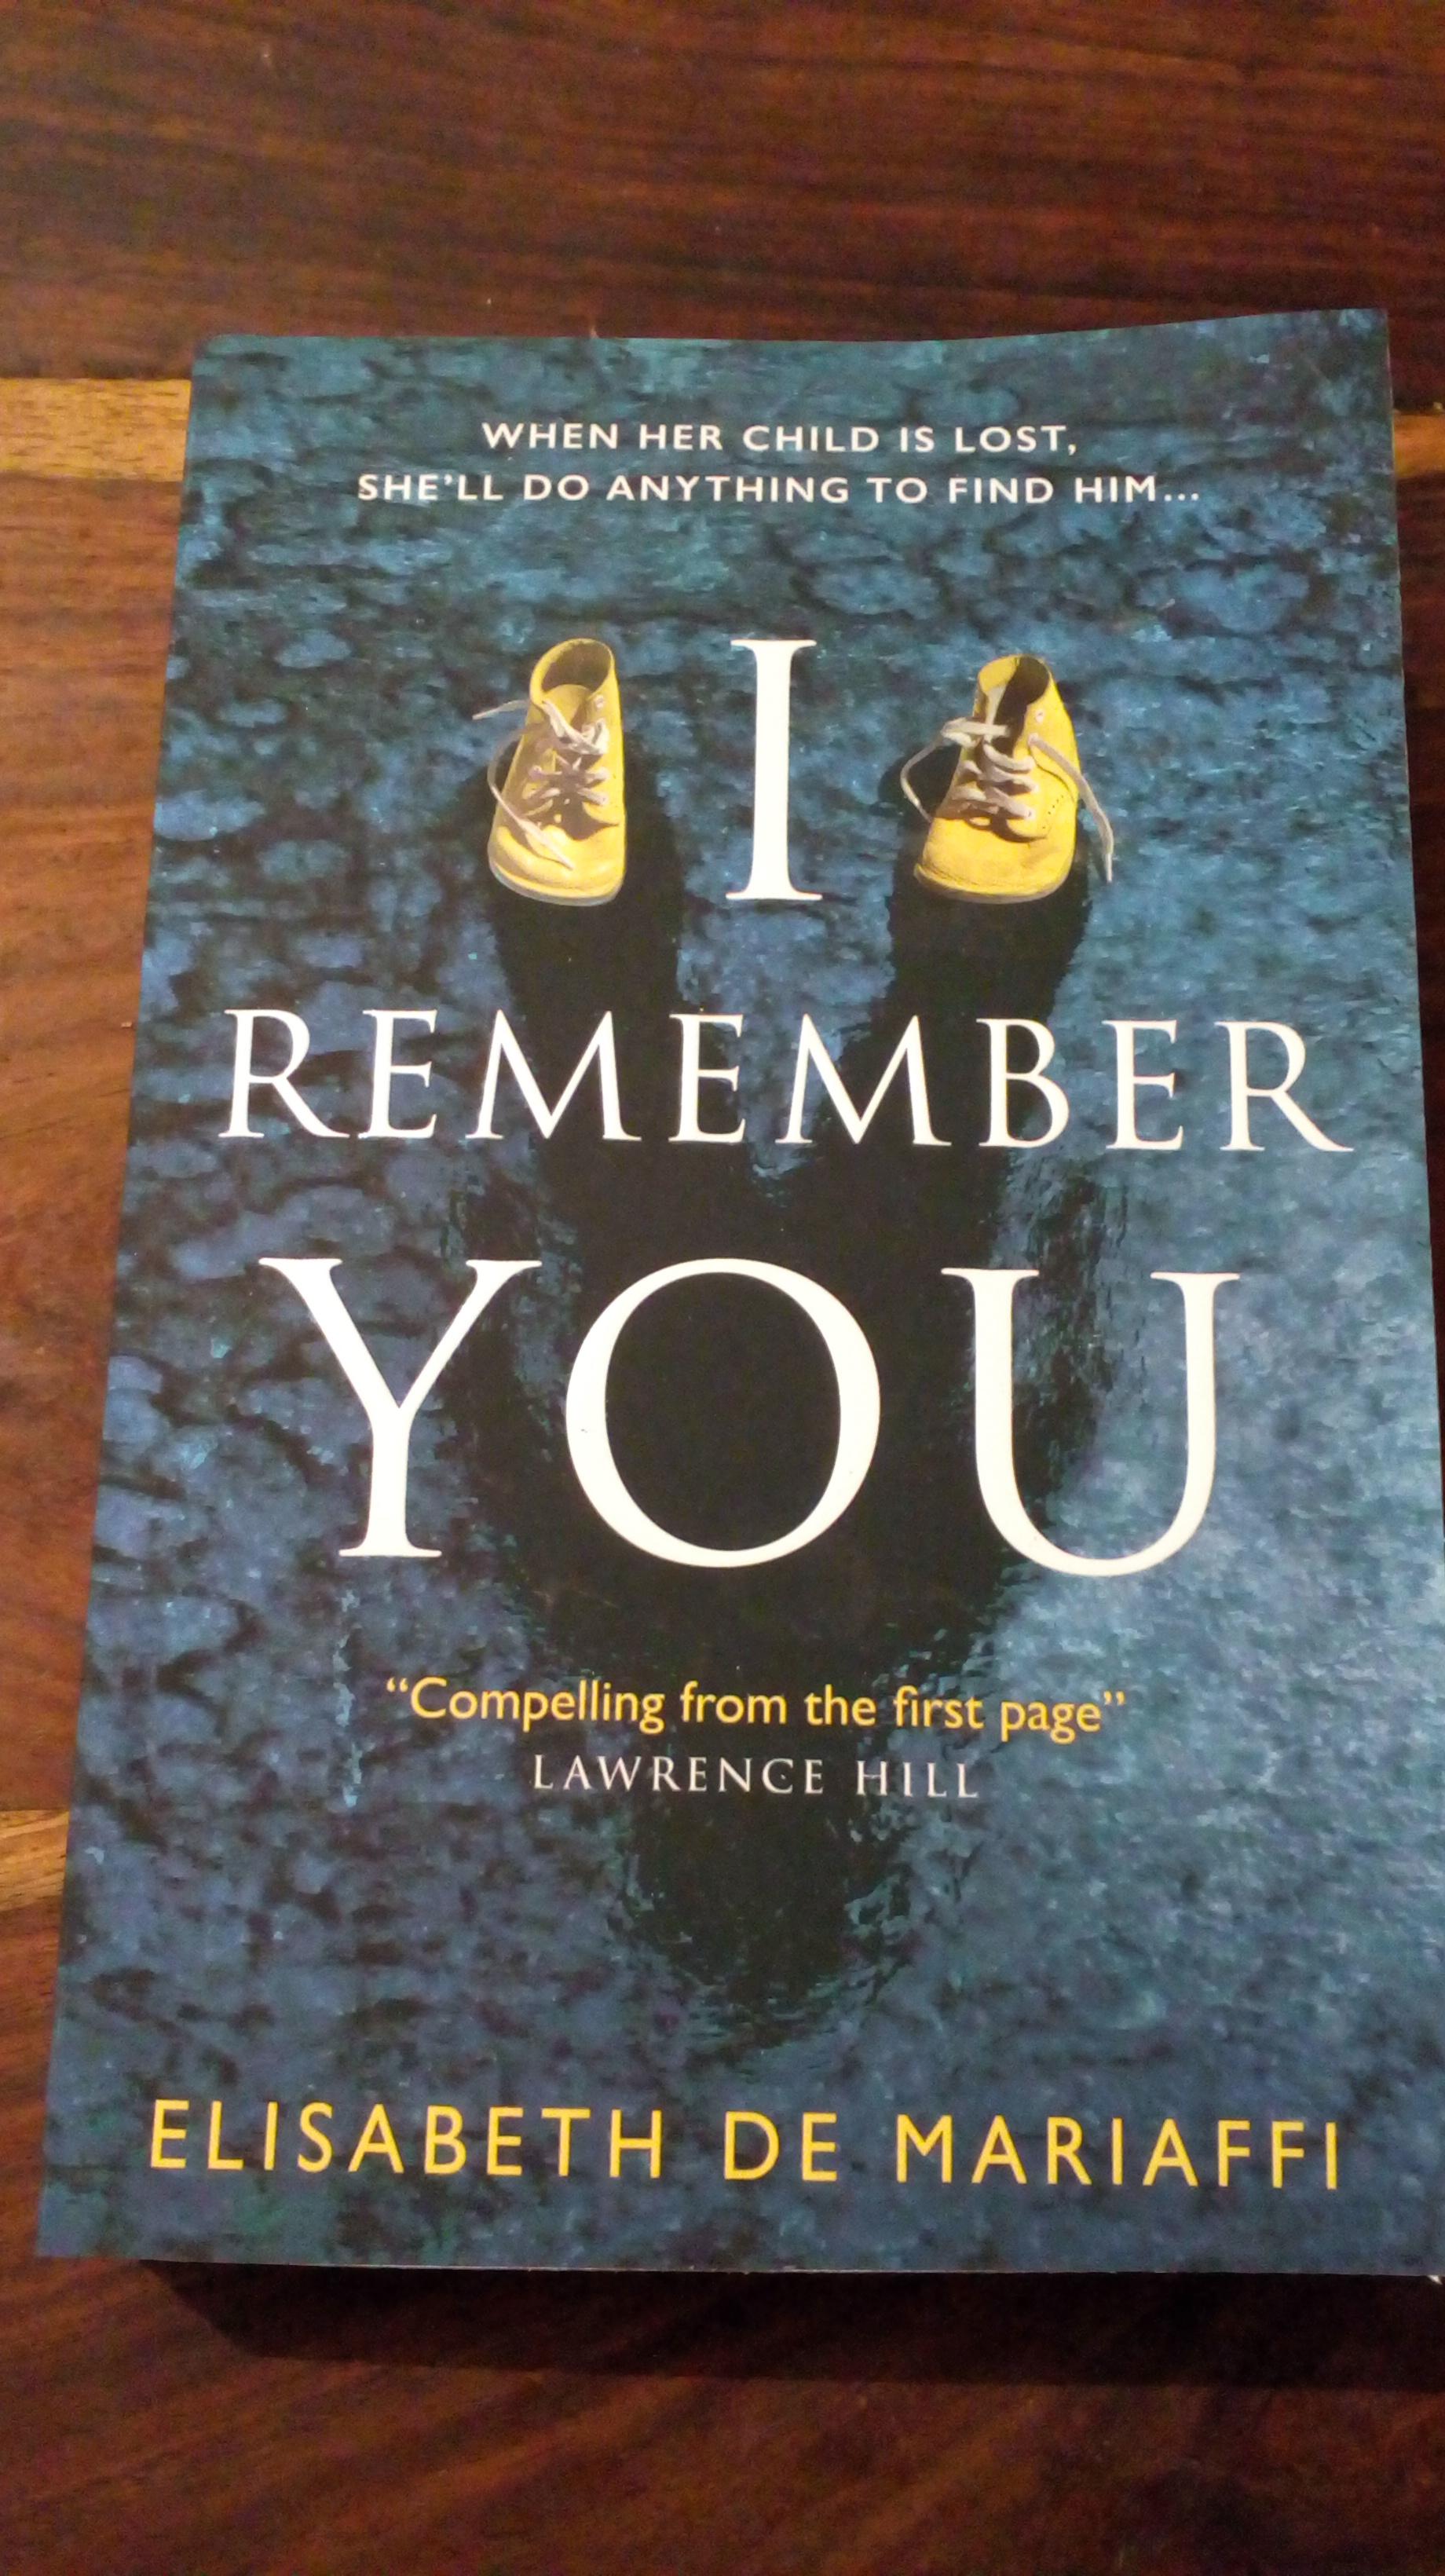 I remember you Elisabeth de Mariaffi Paperback £2 Tesco instore